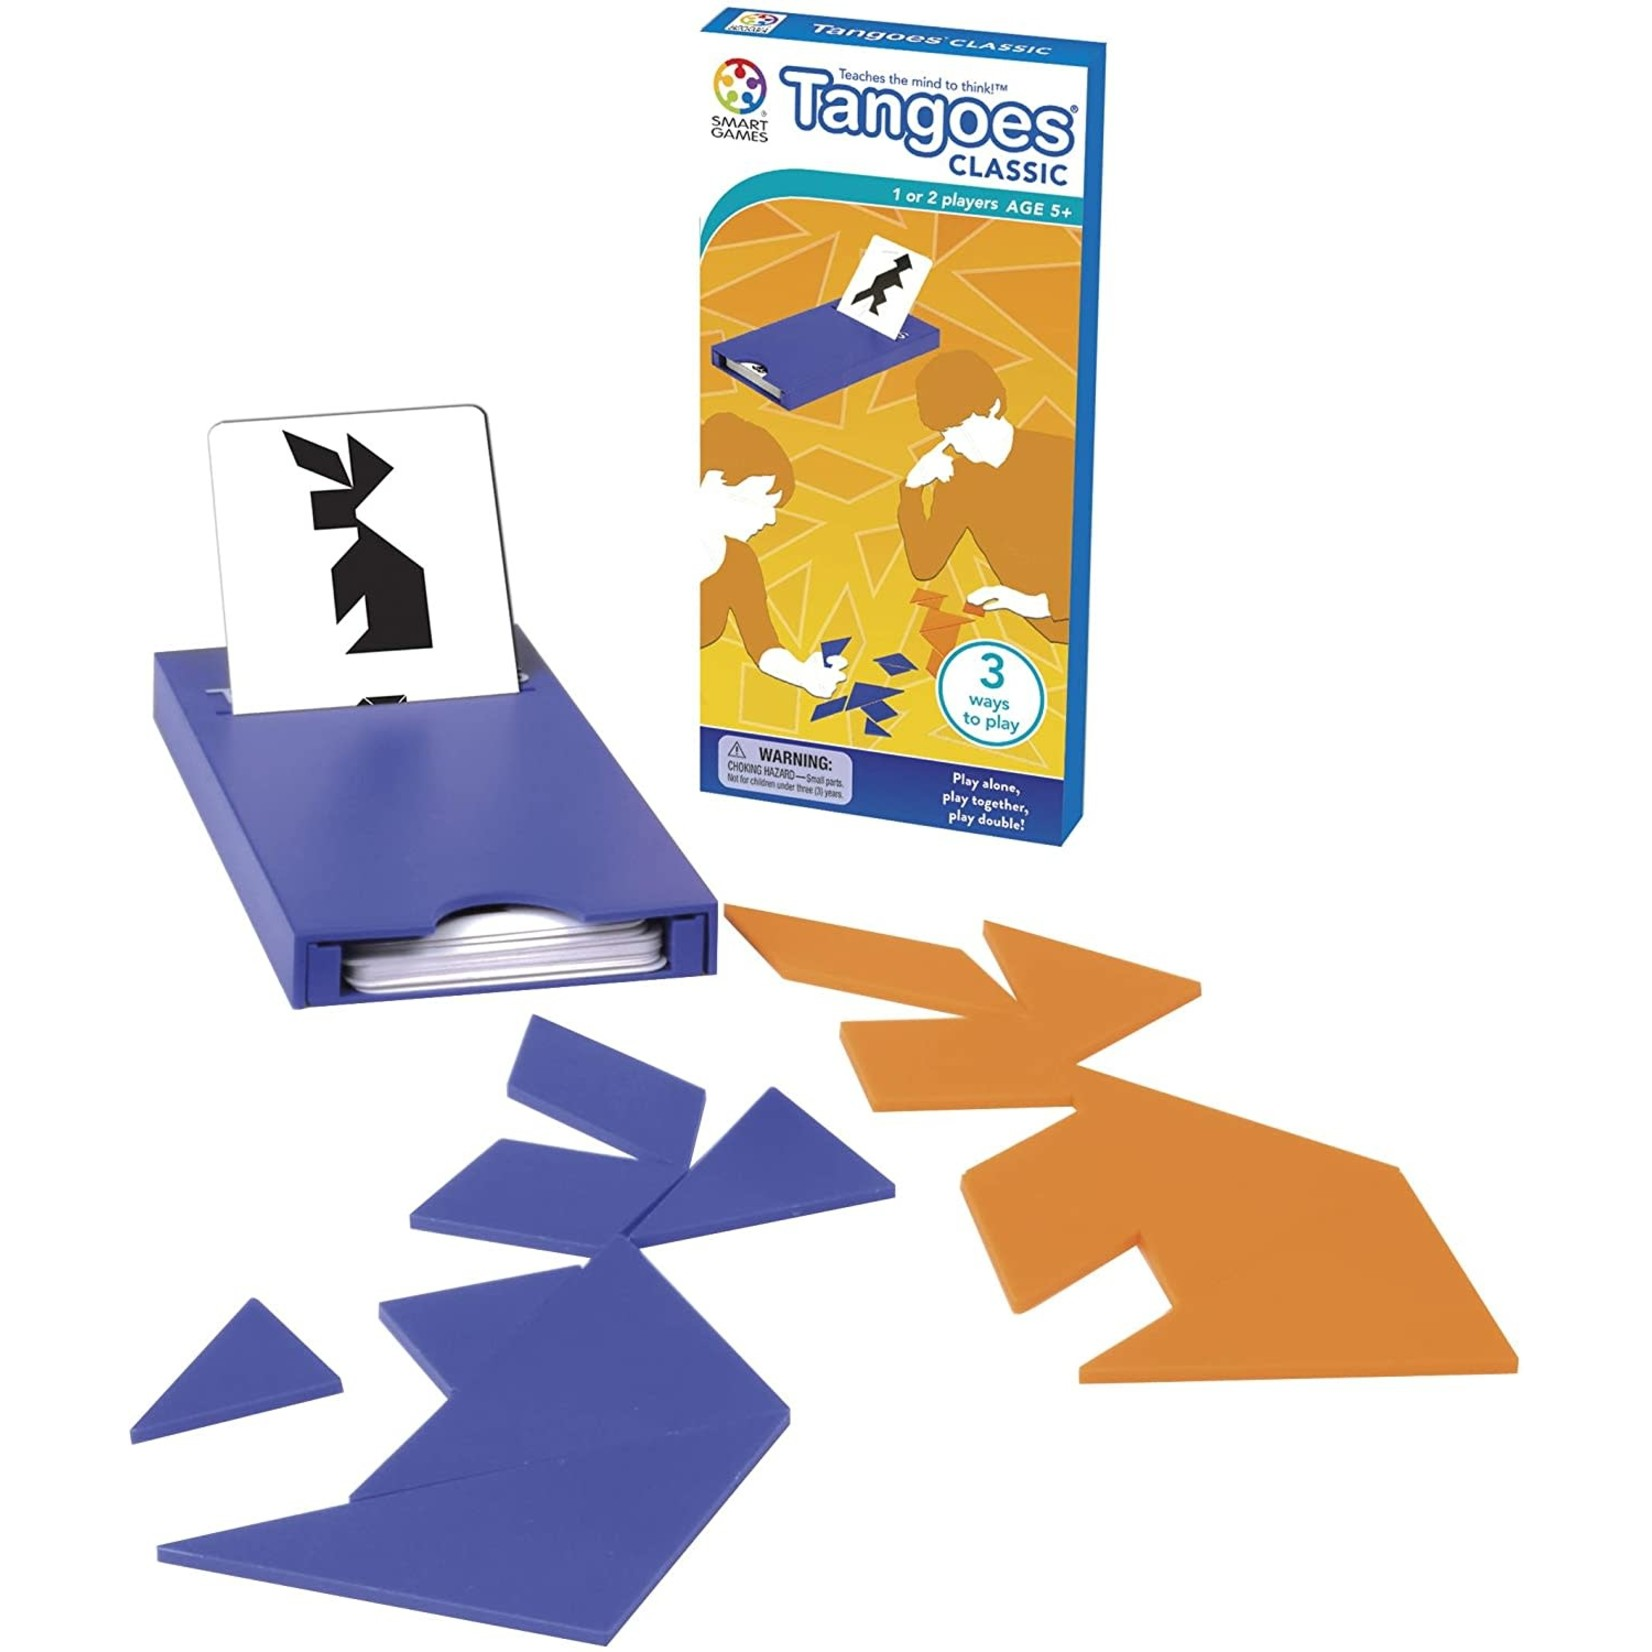 SmartGames Tangoes Classic